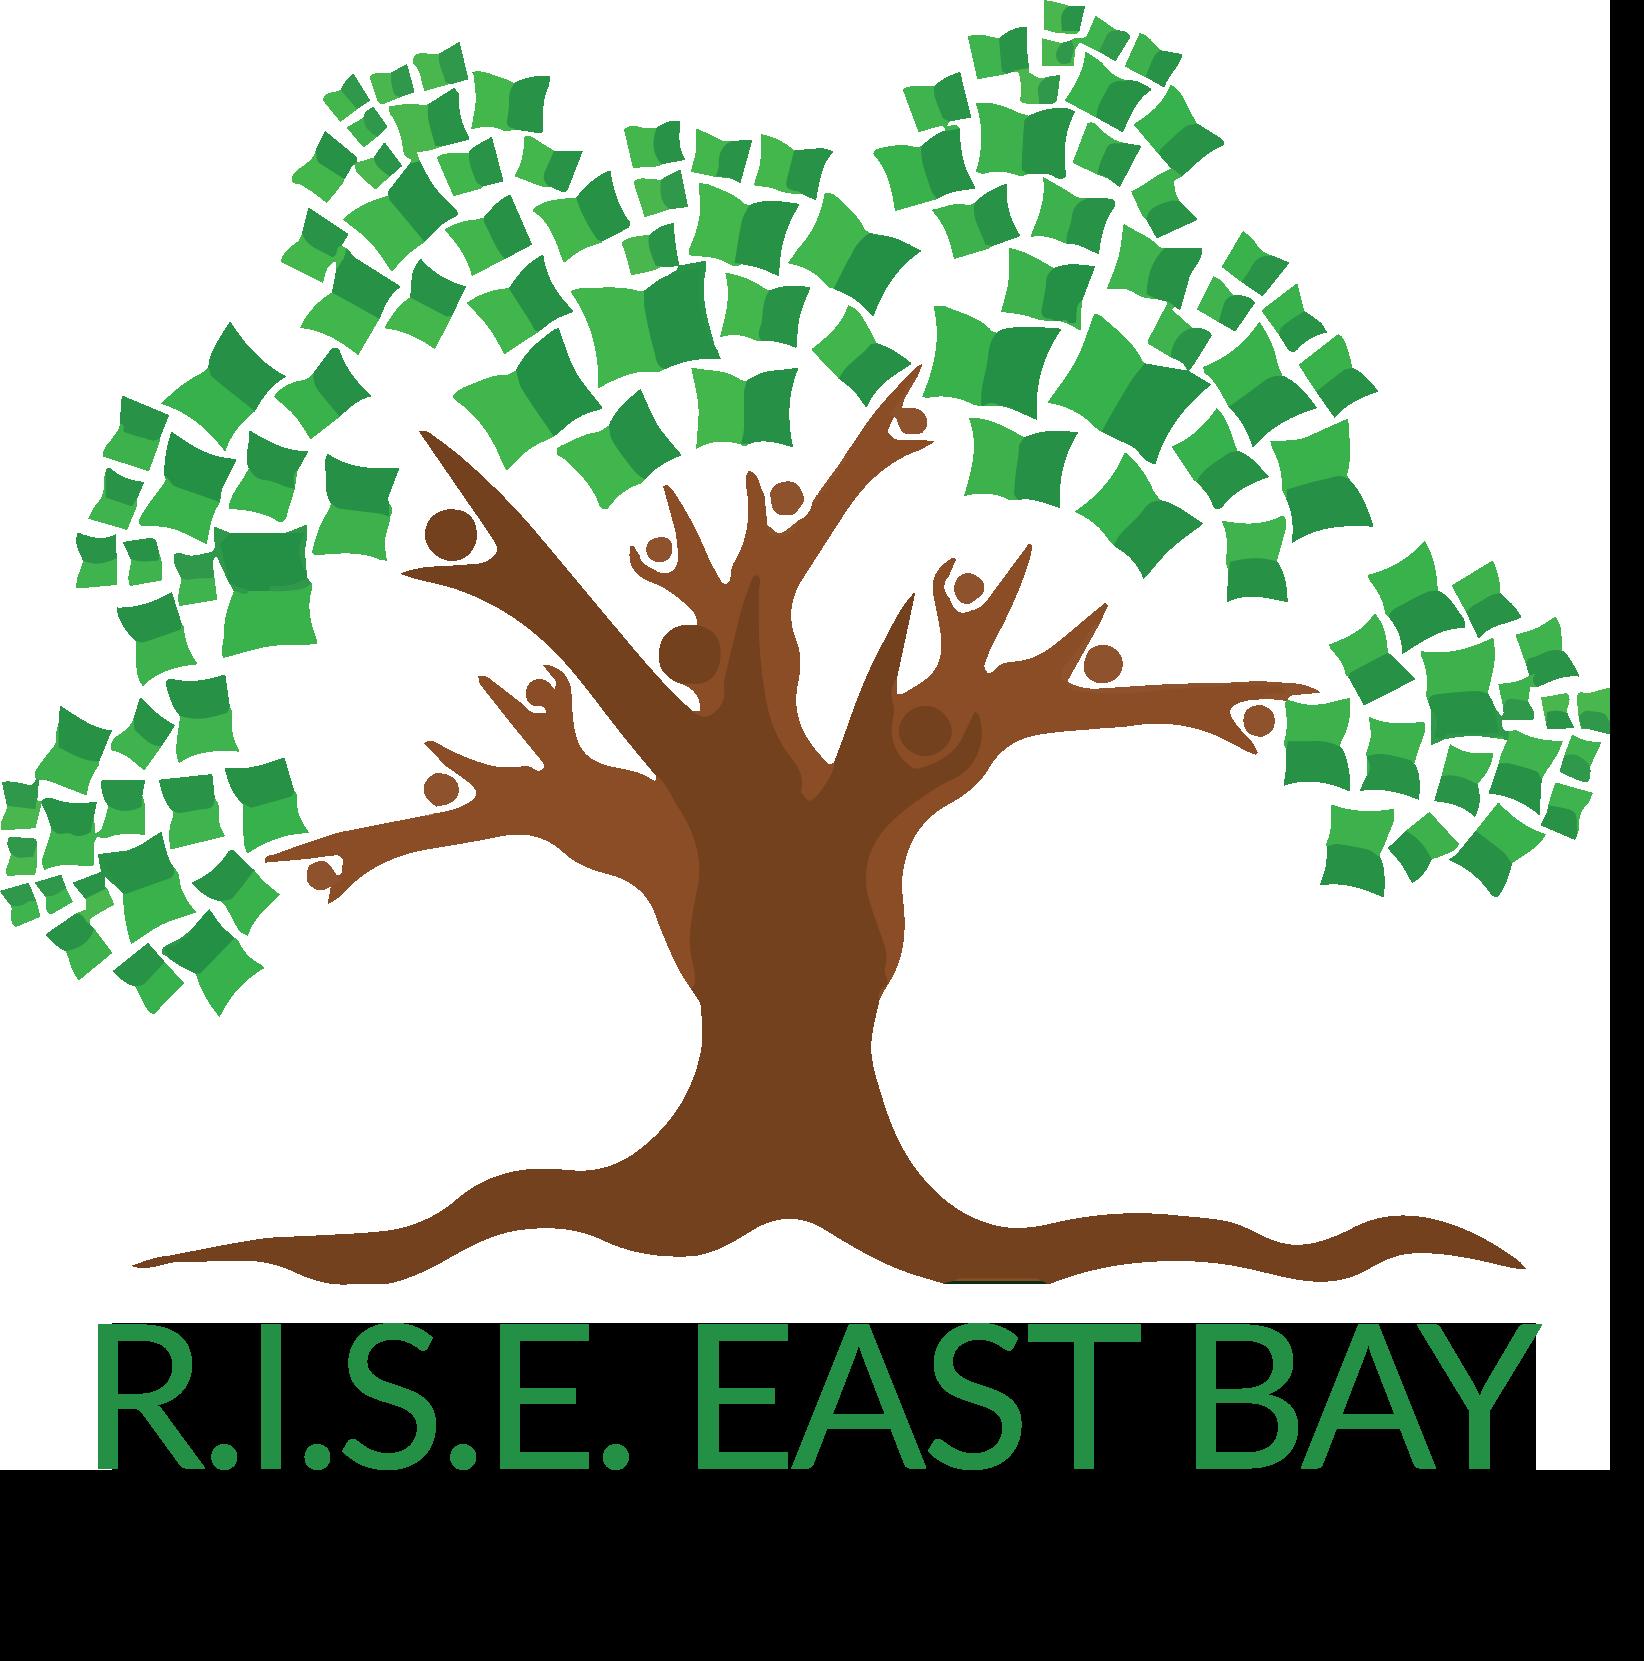 R.I.S.E. EAST BAY